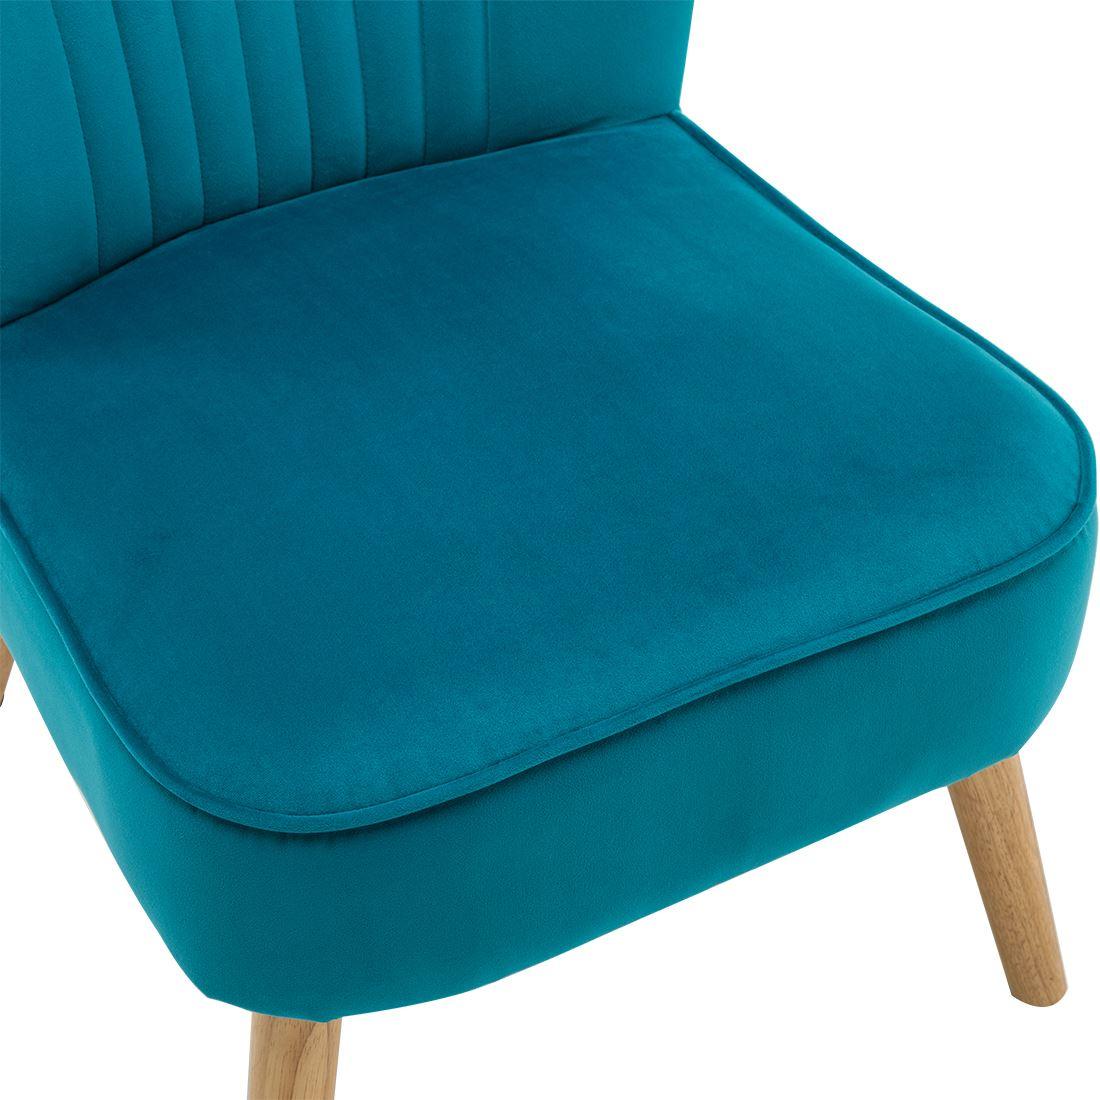 Lyssa-Velvet-Retro-Occasional-Bedroom-Living-Room-Accent-Chair-Fabric-Tub